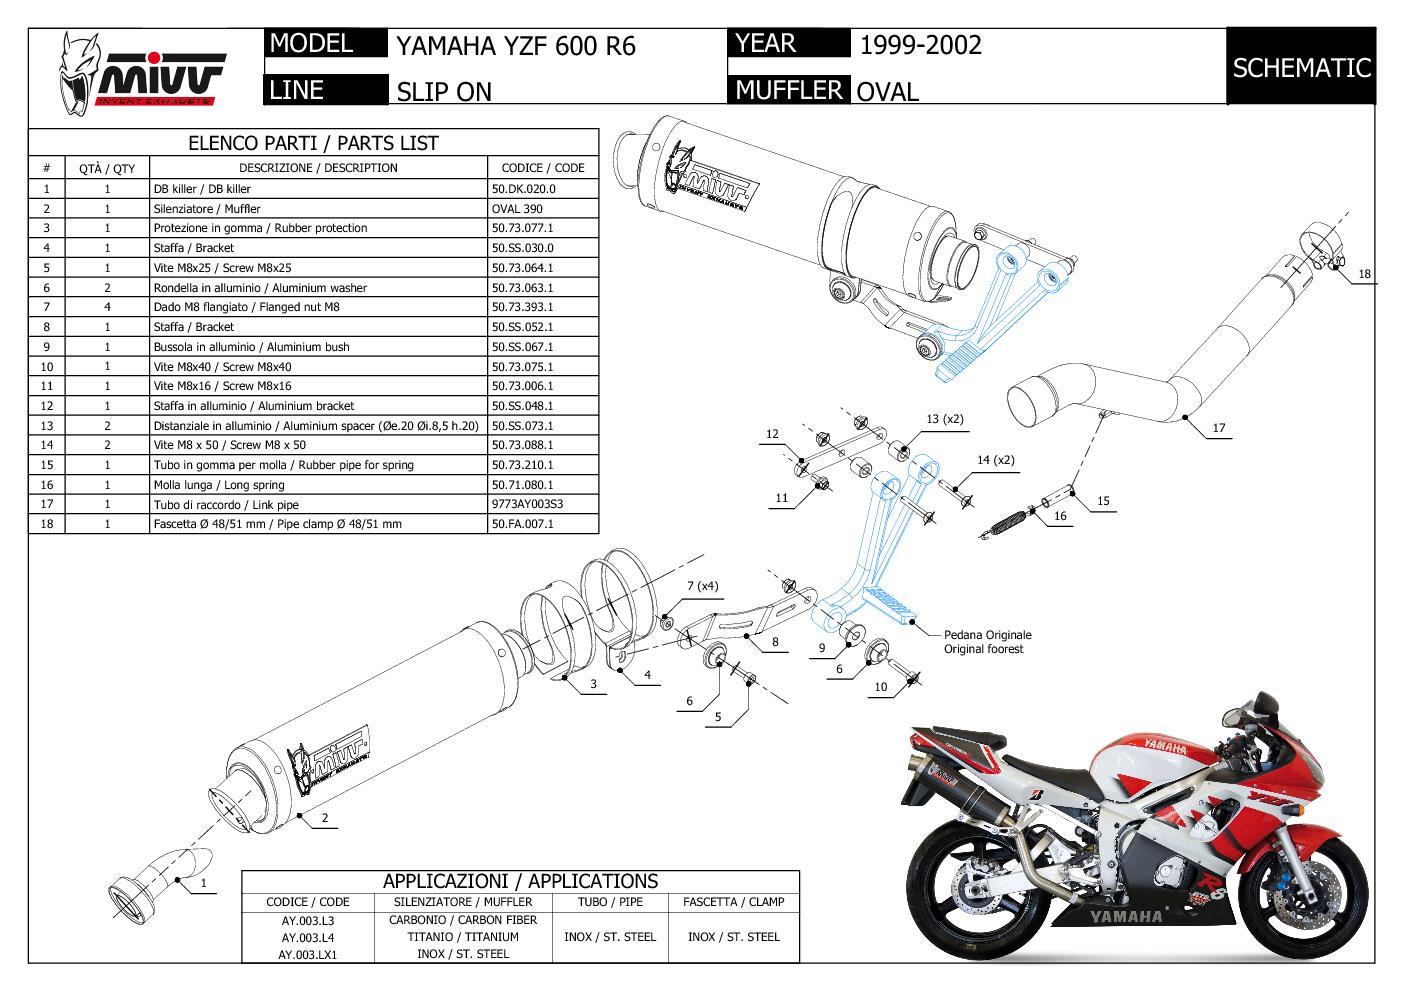 Mivv Exhaust Muffler Oval Carbon Fiber High for Yamaha Yzf